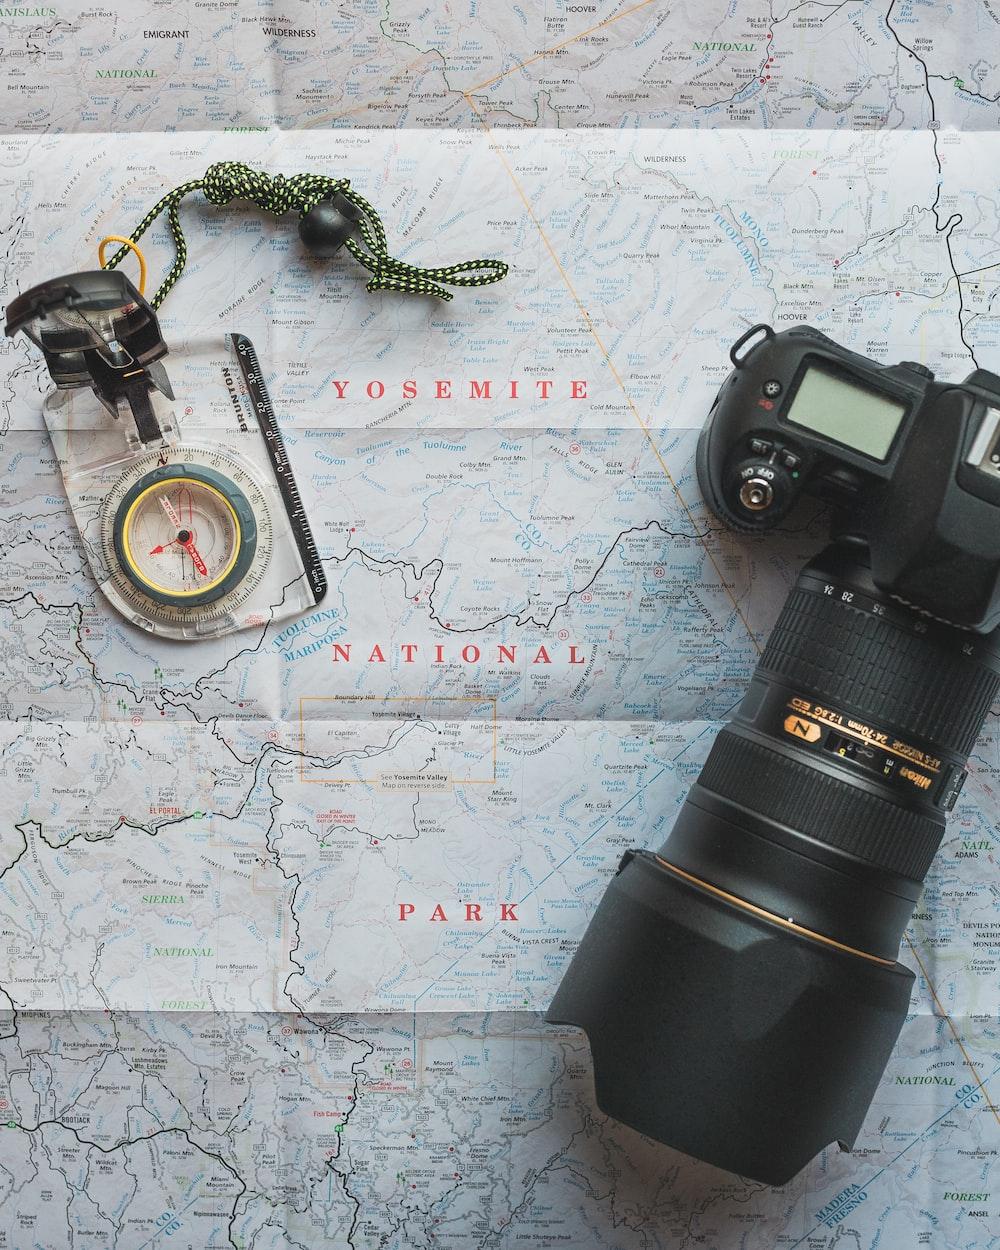 black Nikon DSLR camera beside of map compass